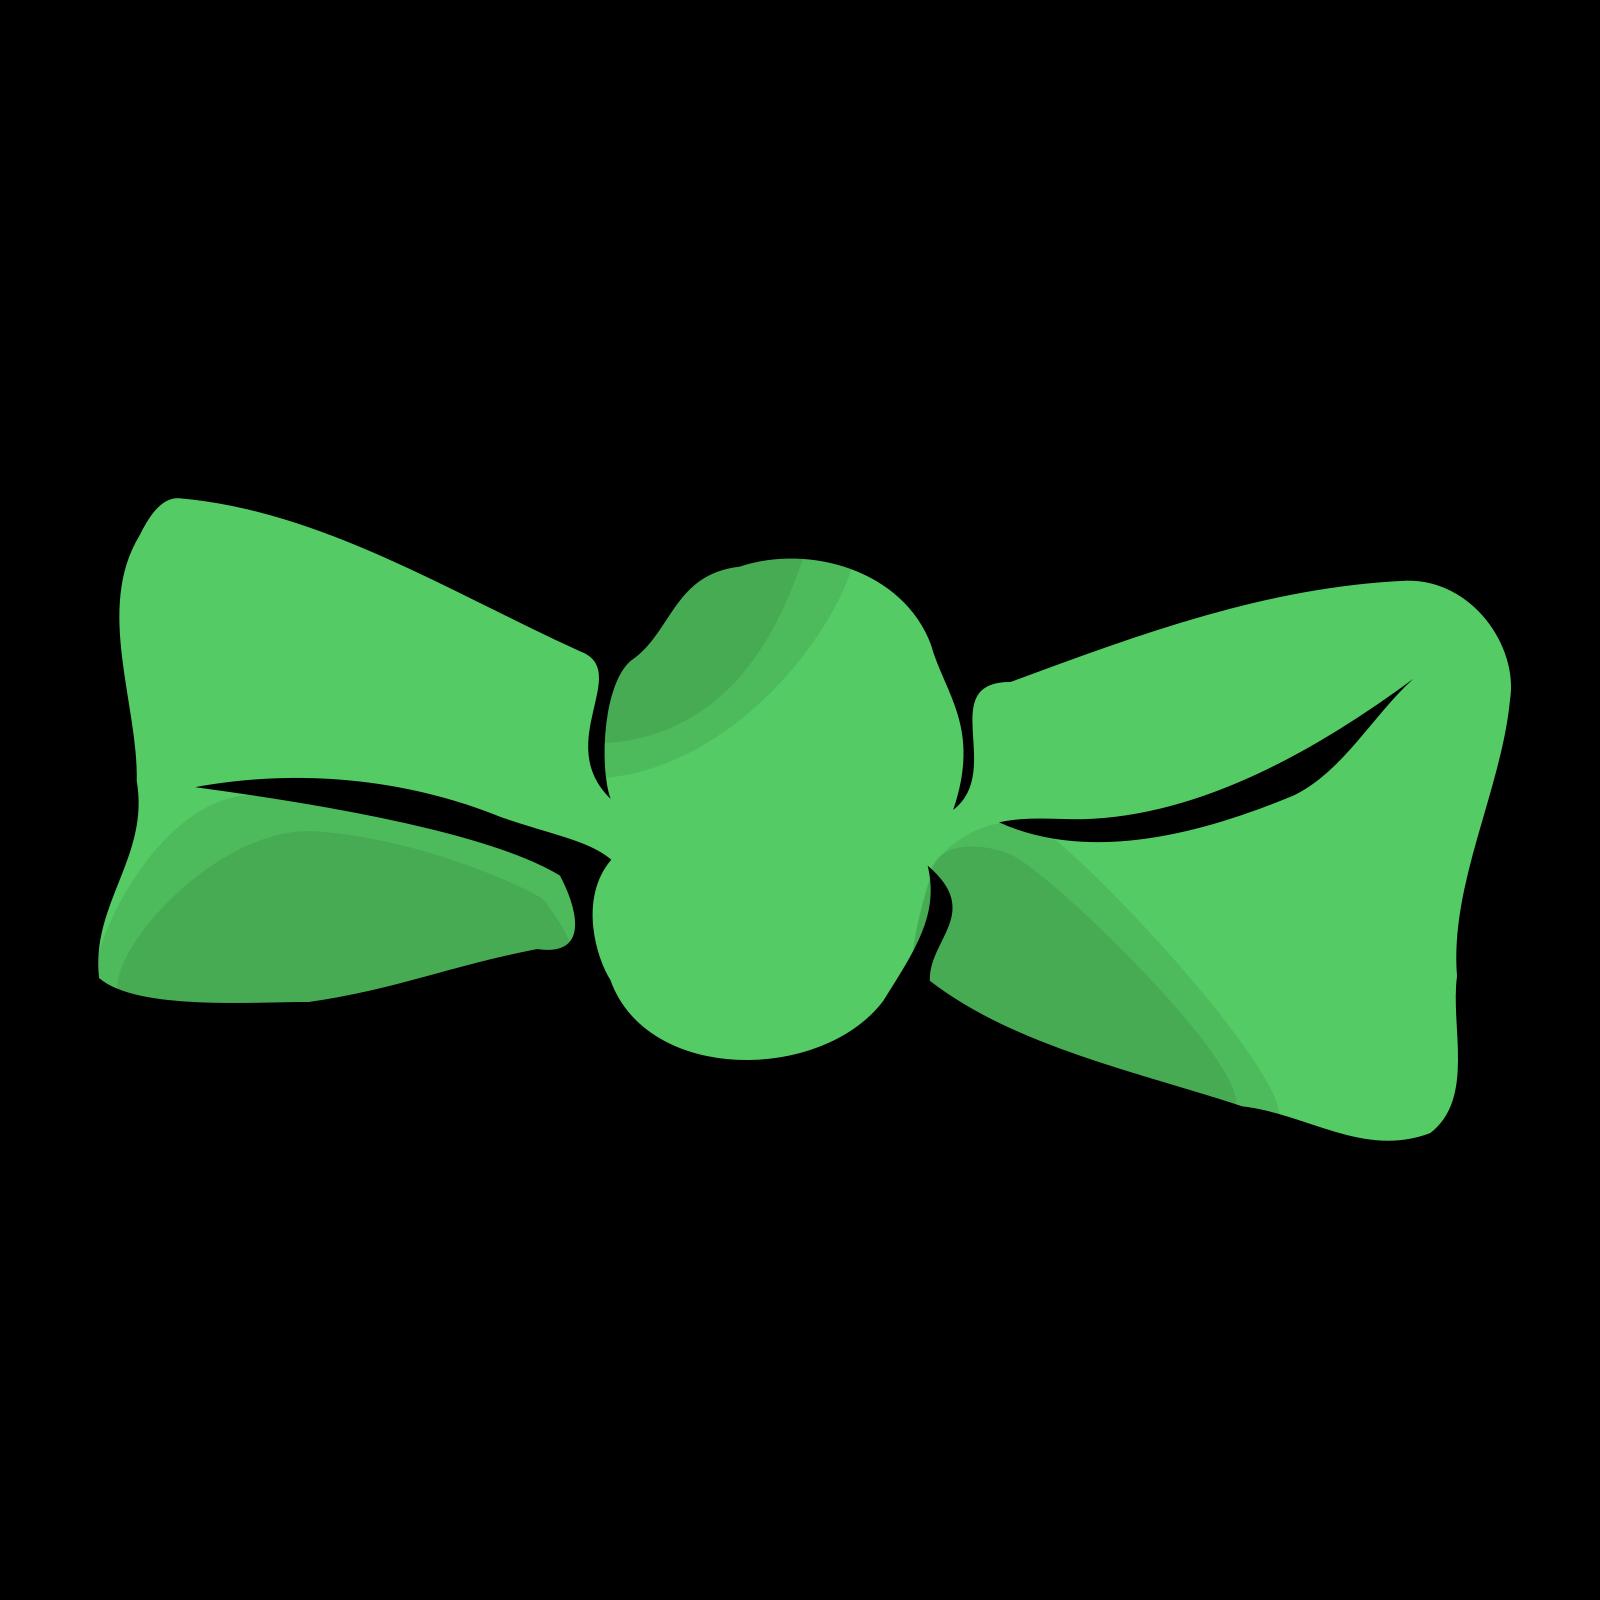 Bow SVG Clip arts